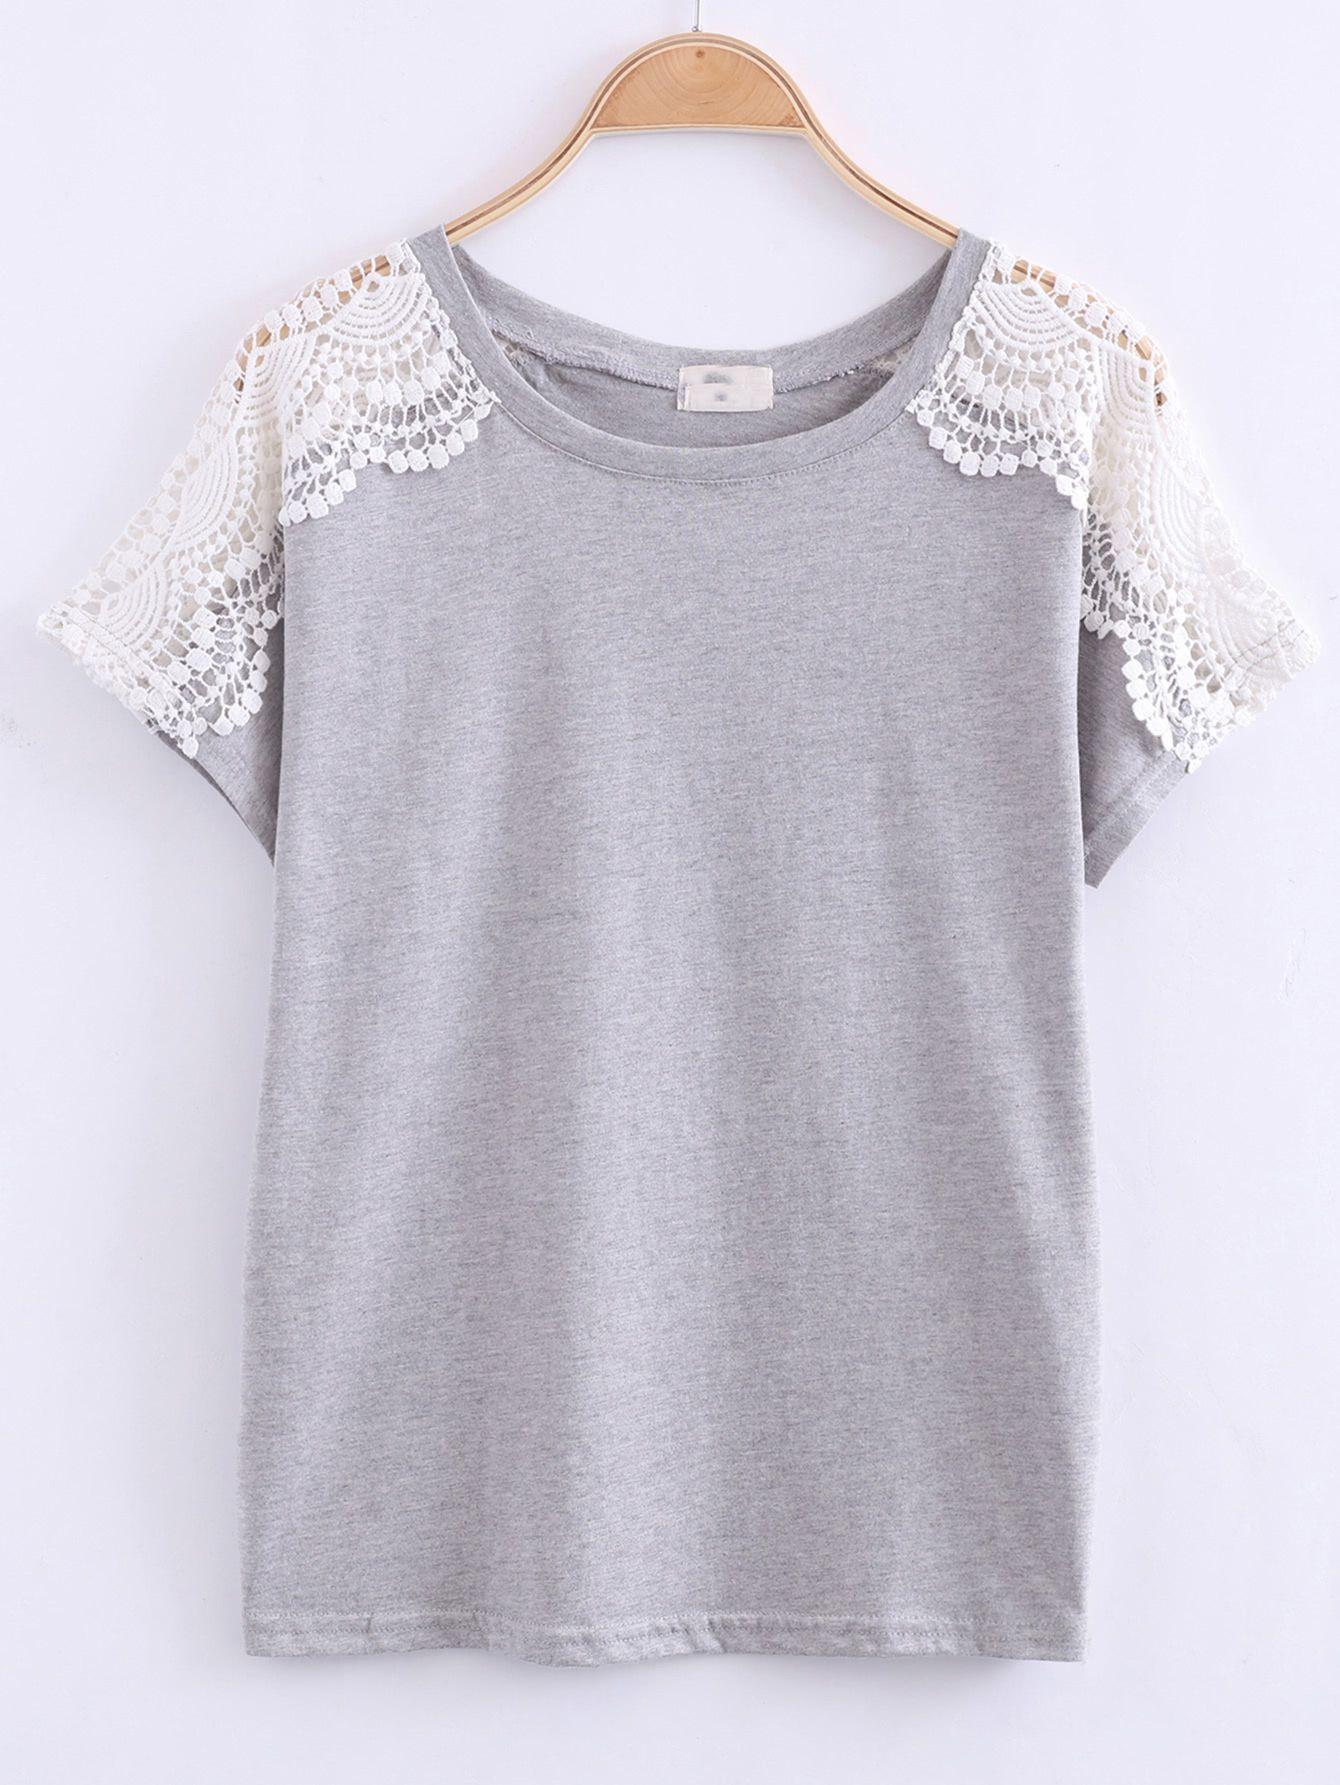 Camiseta suelta manga corta encaje-gris-Spanish SheIn(Sheinside ...